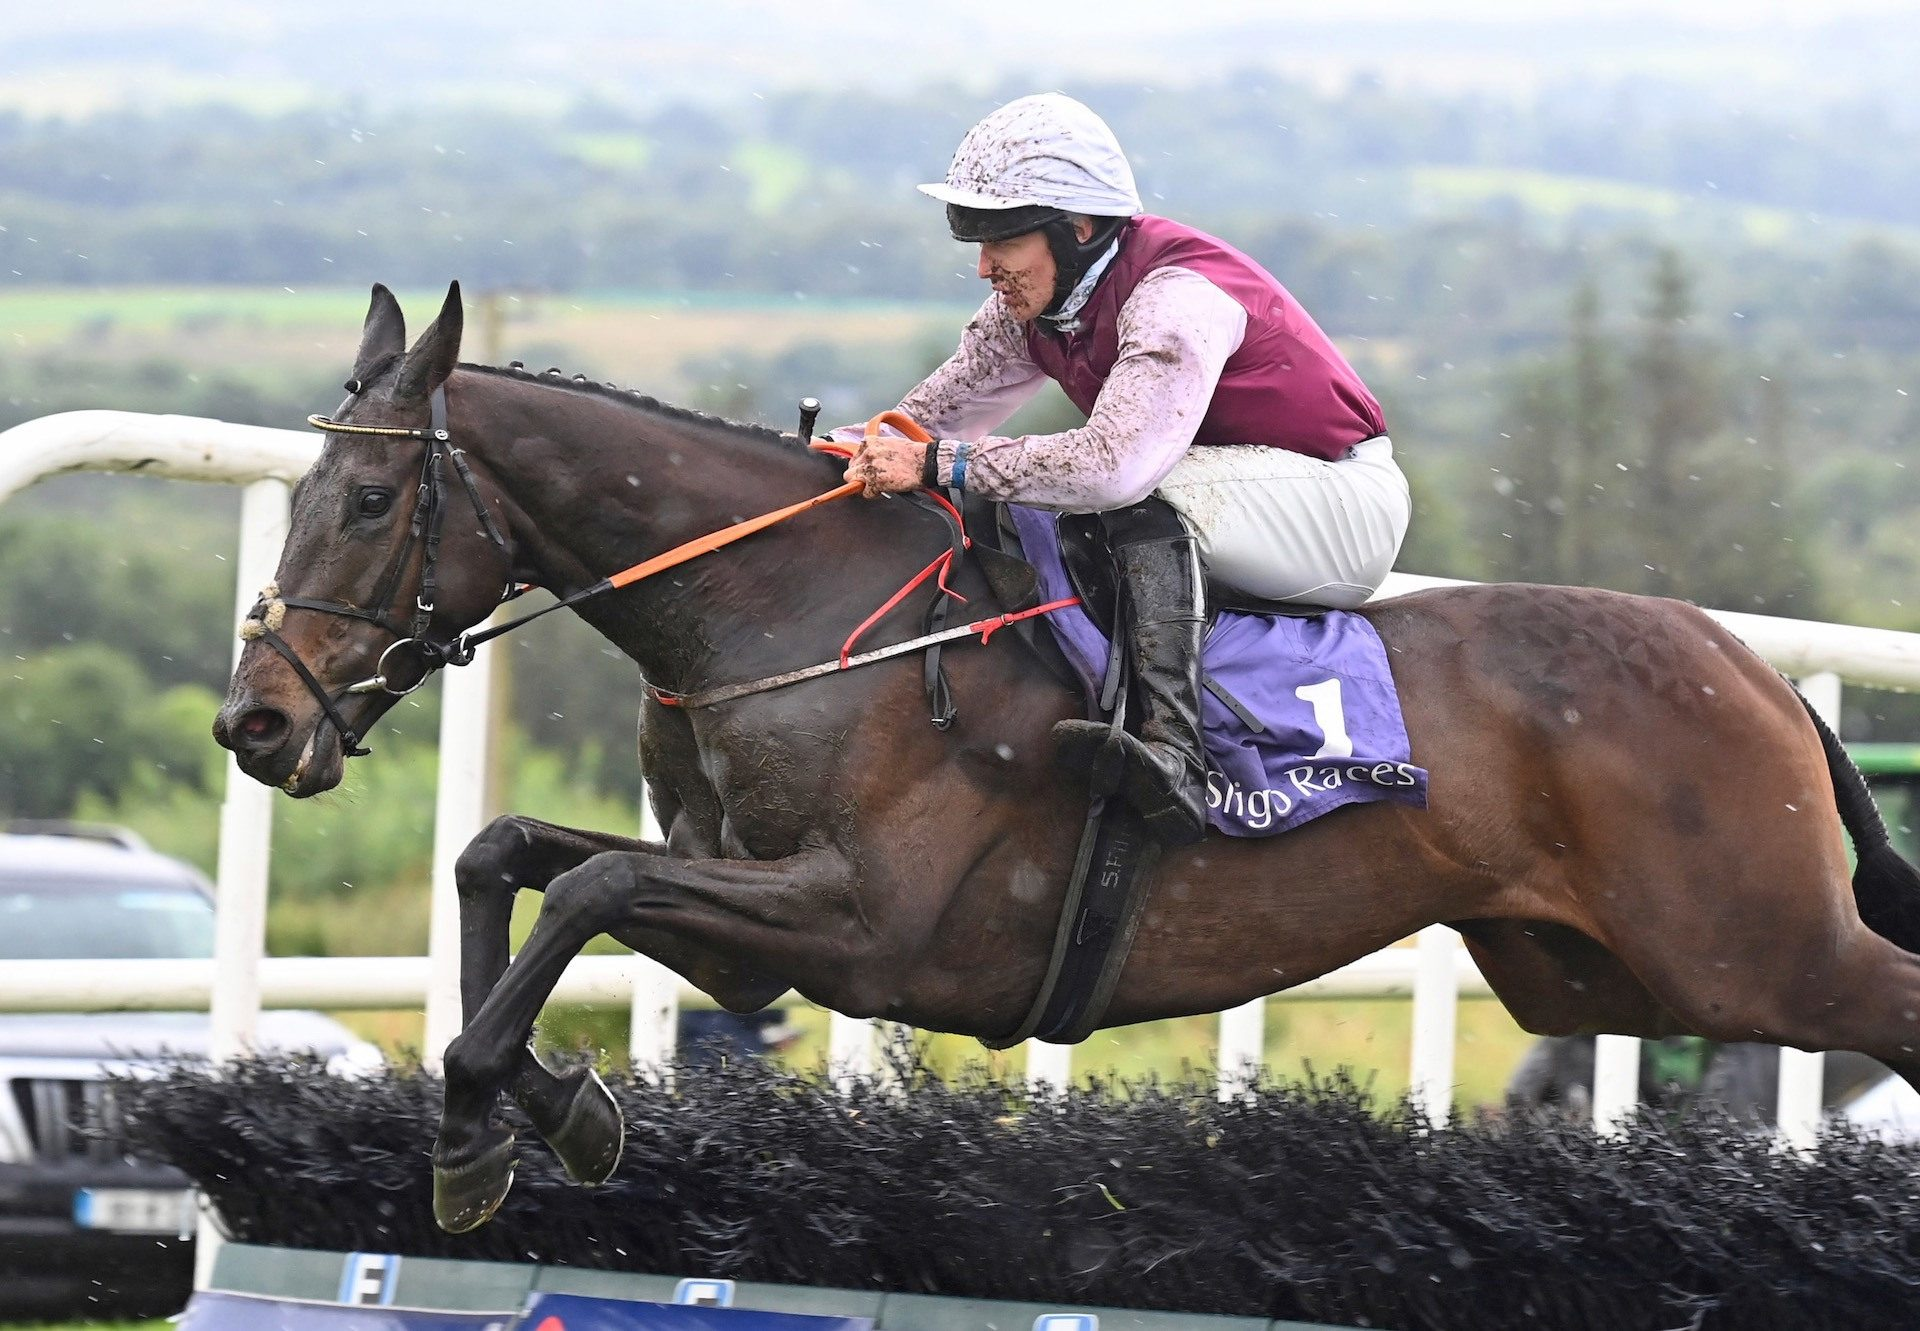 The Little Yank (Westerner) Wins The Rated Novice Hurdle At Sligo